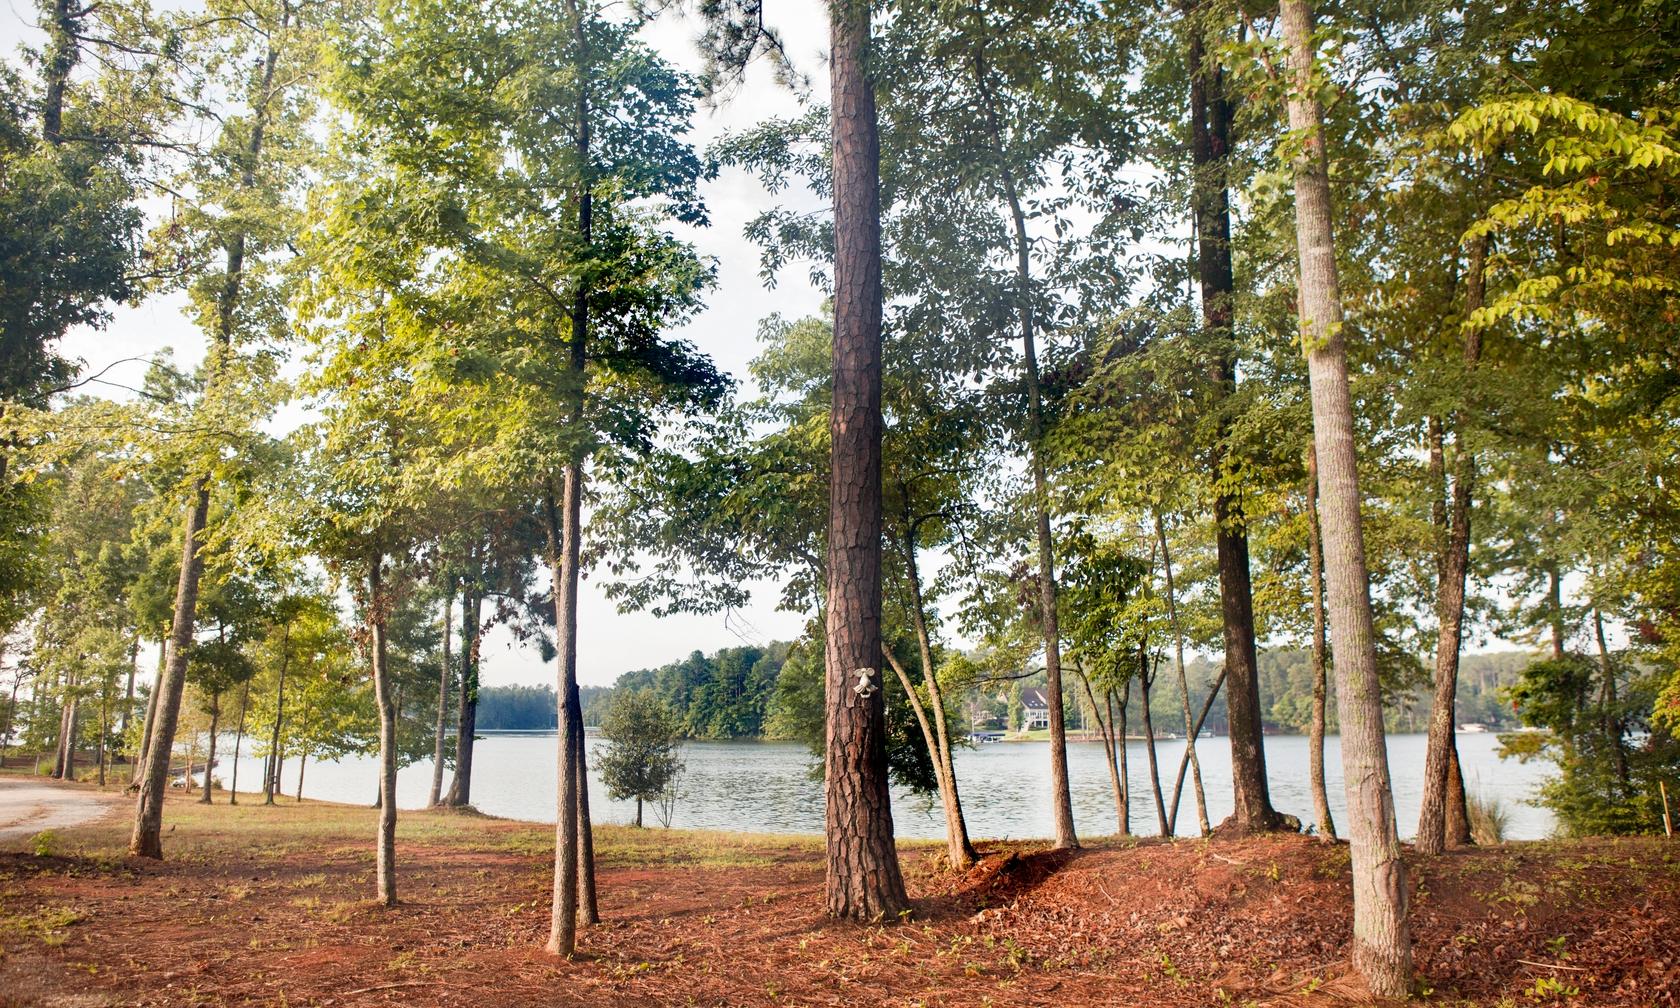 Vacation rentals in Lake Oconee